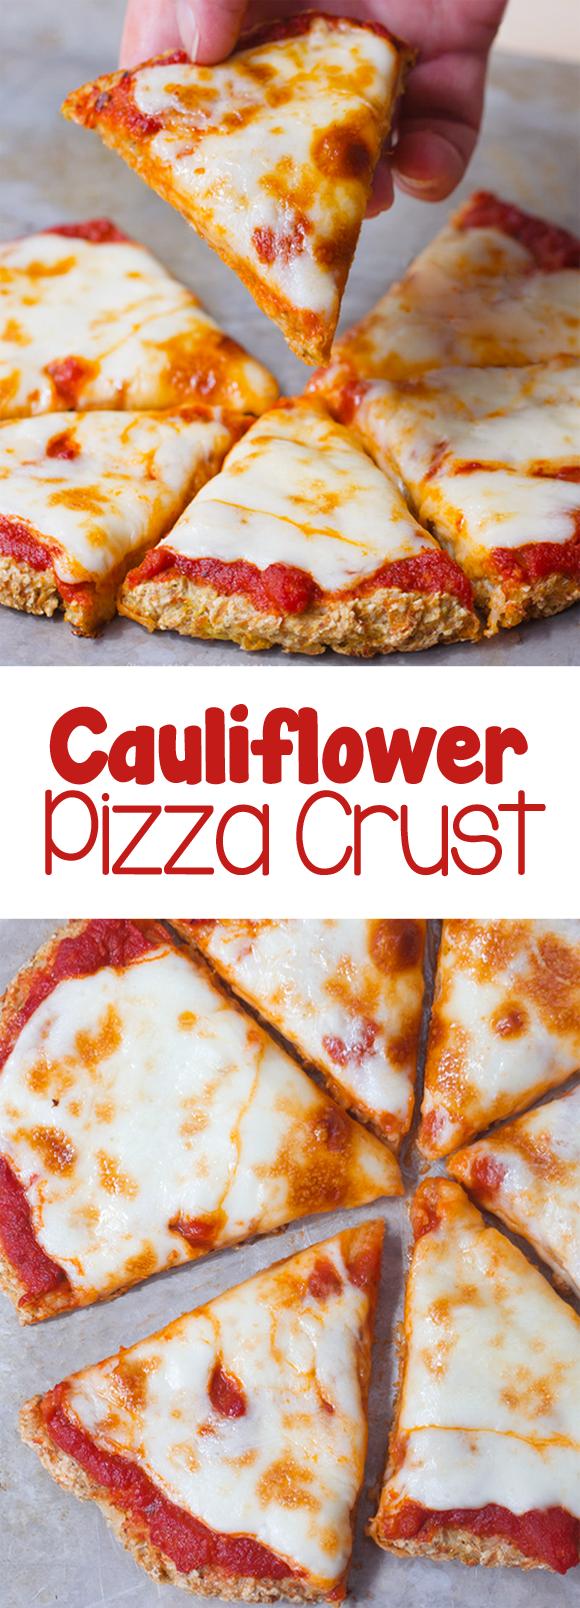 How To Make The Best Easy Cauliflower Pizza Crust Recipe